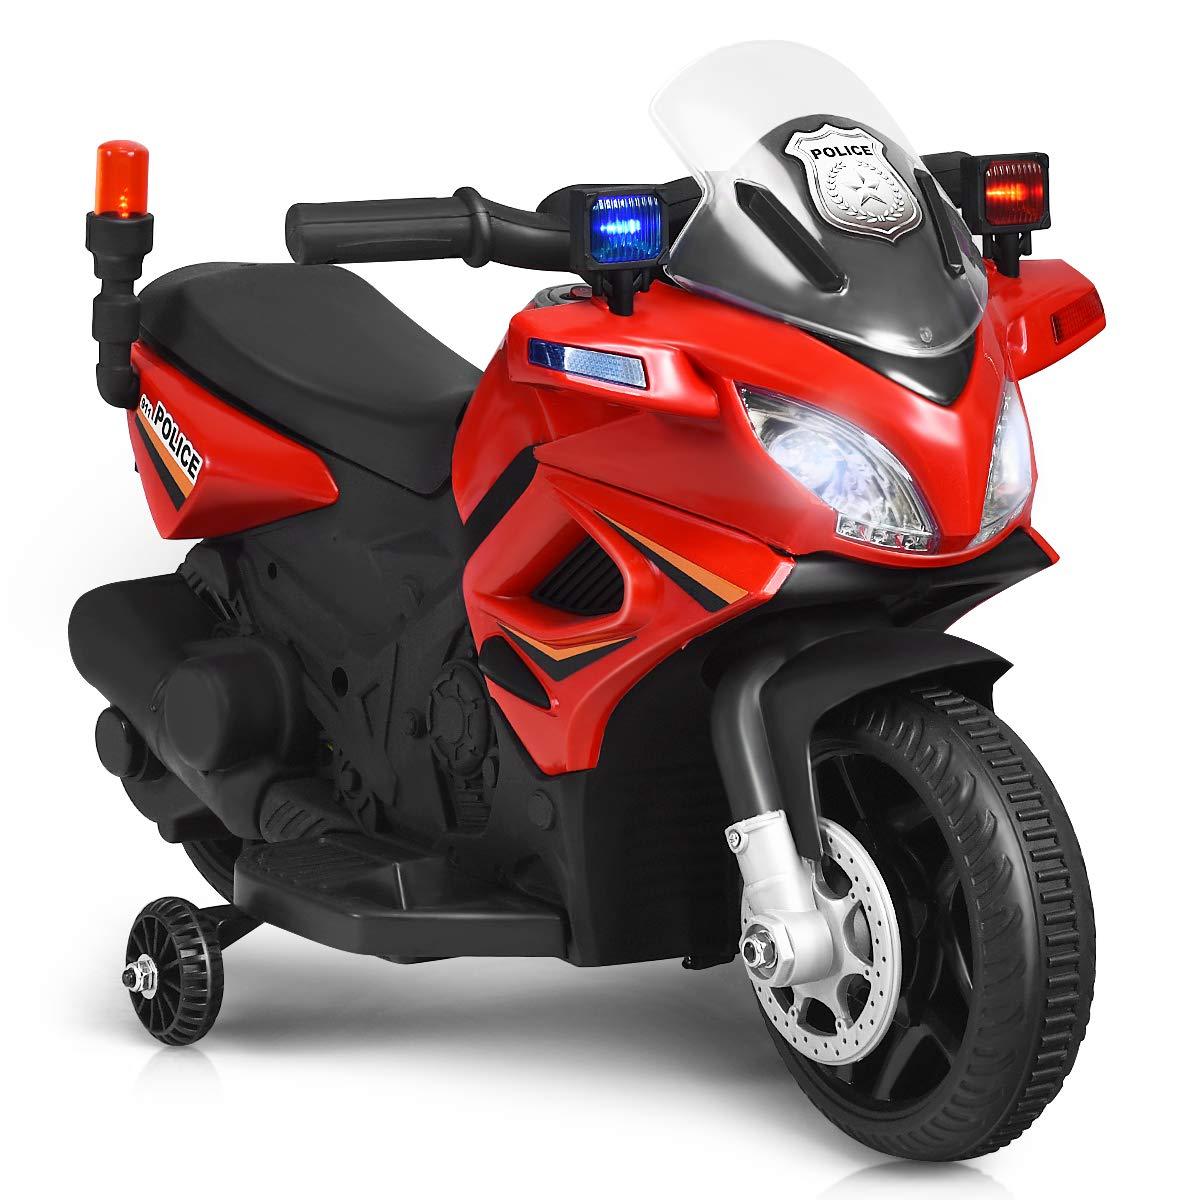 Costzon Motorcycle Electric Headlights Rechargeable